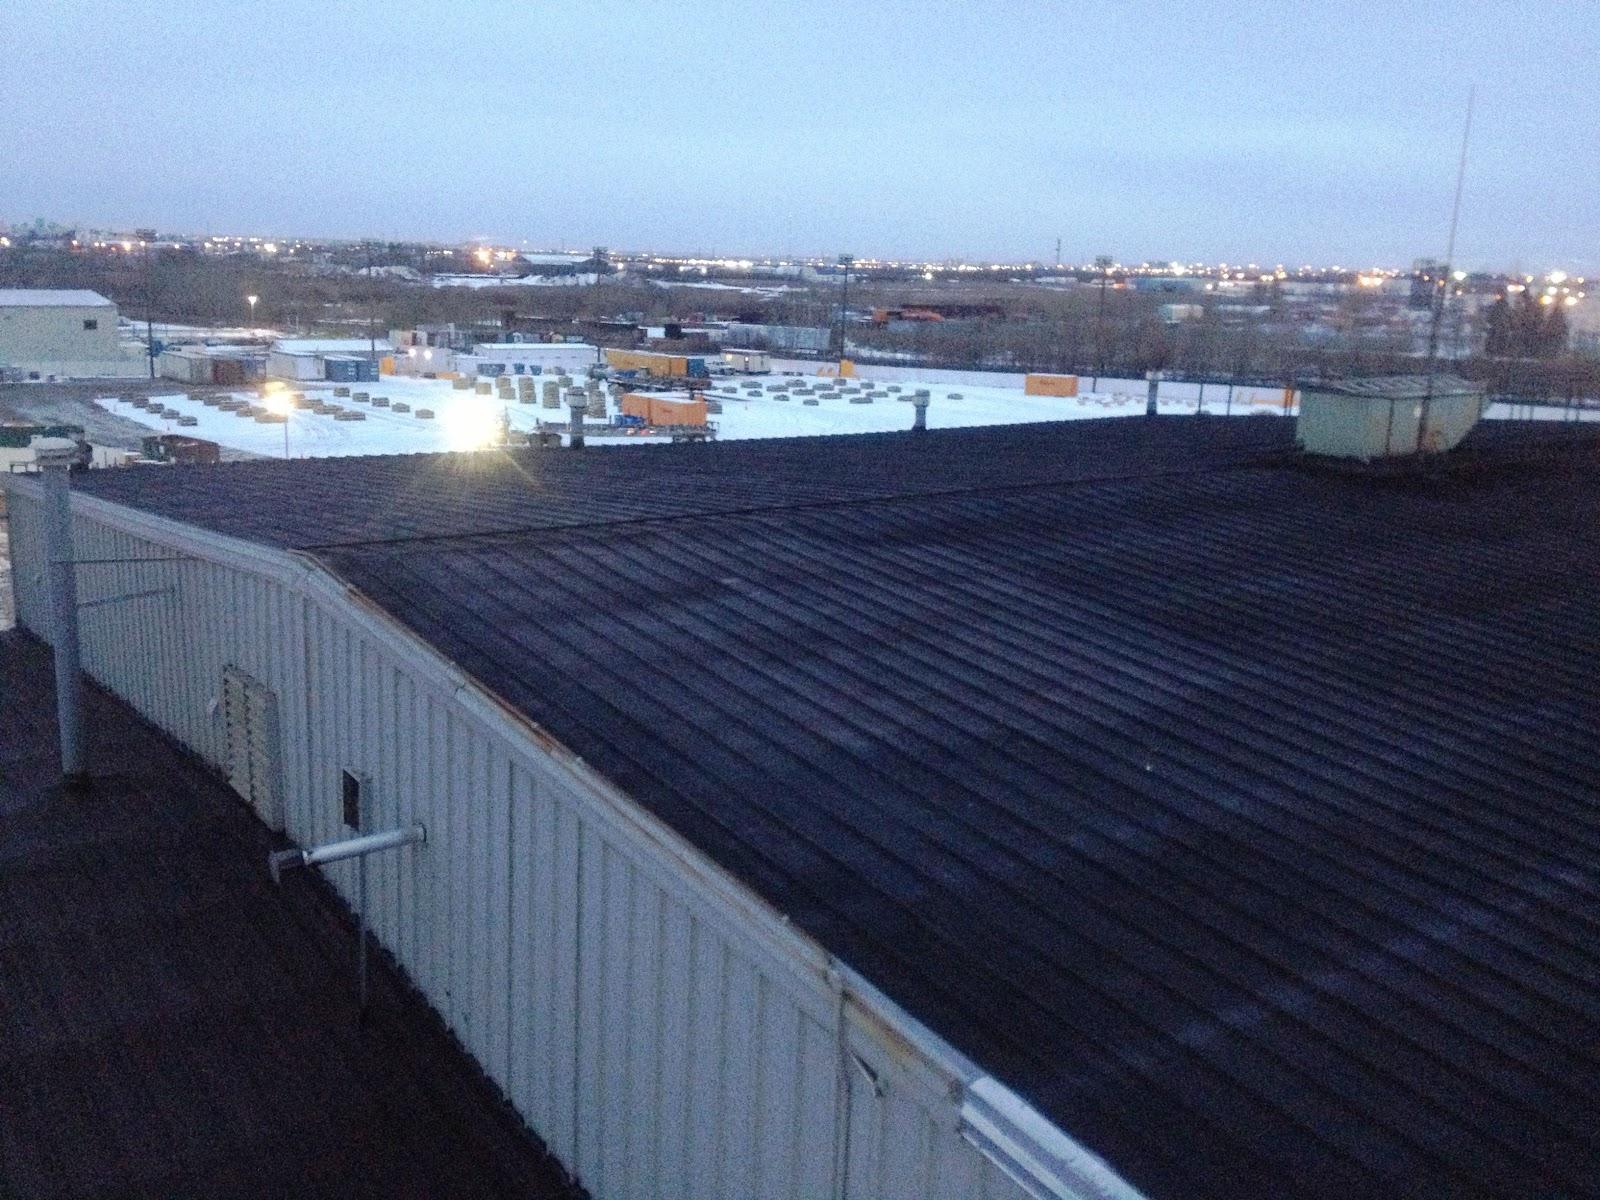 liquid rubber repaired this roof - Liquid Rubber Roof